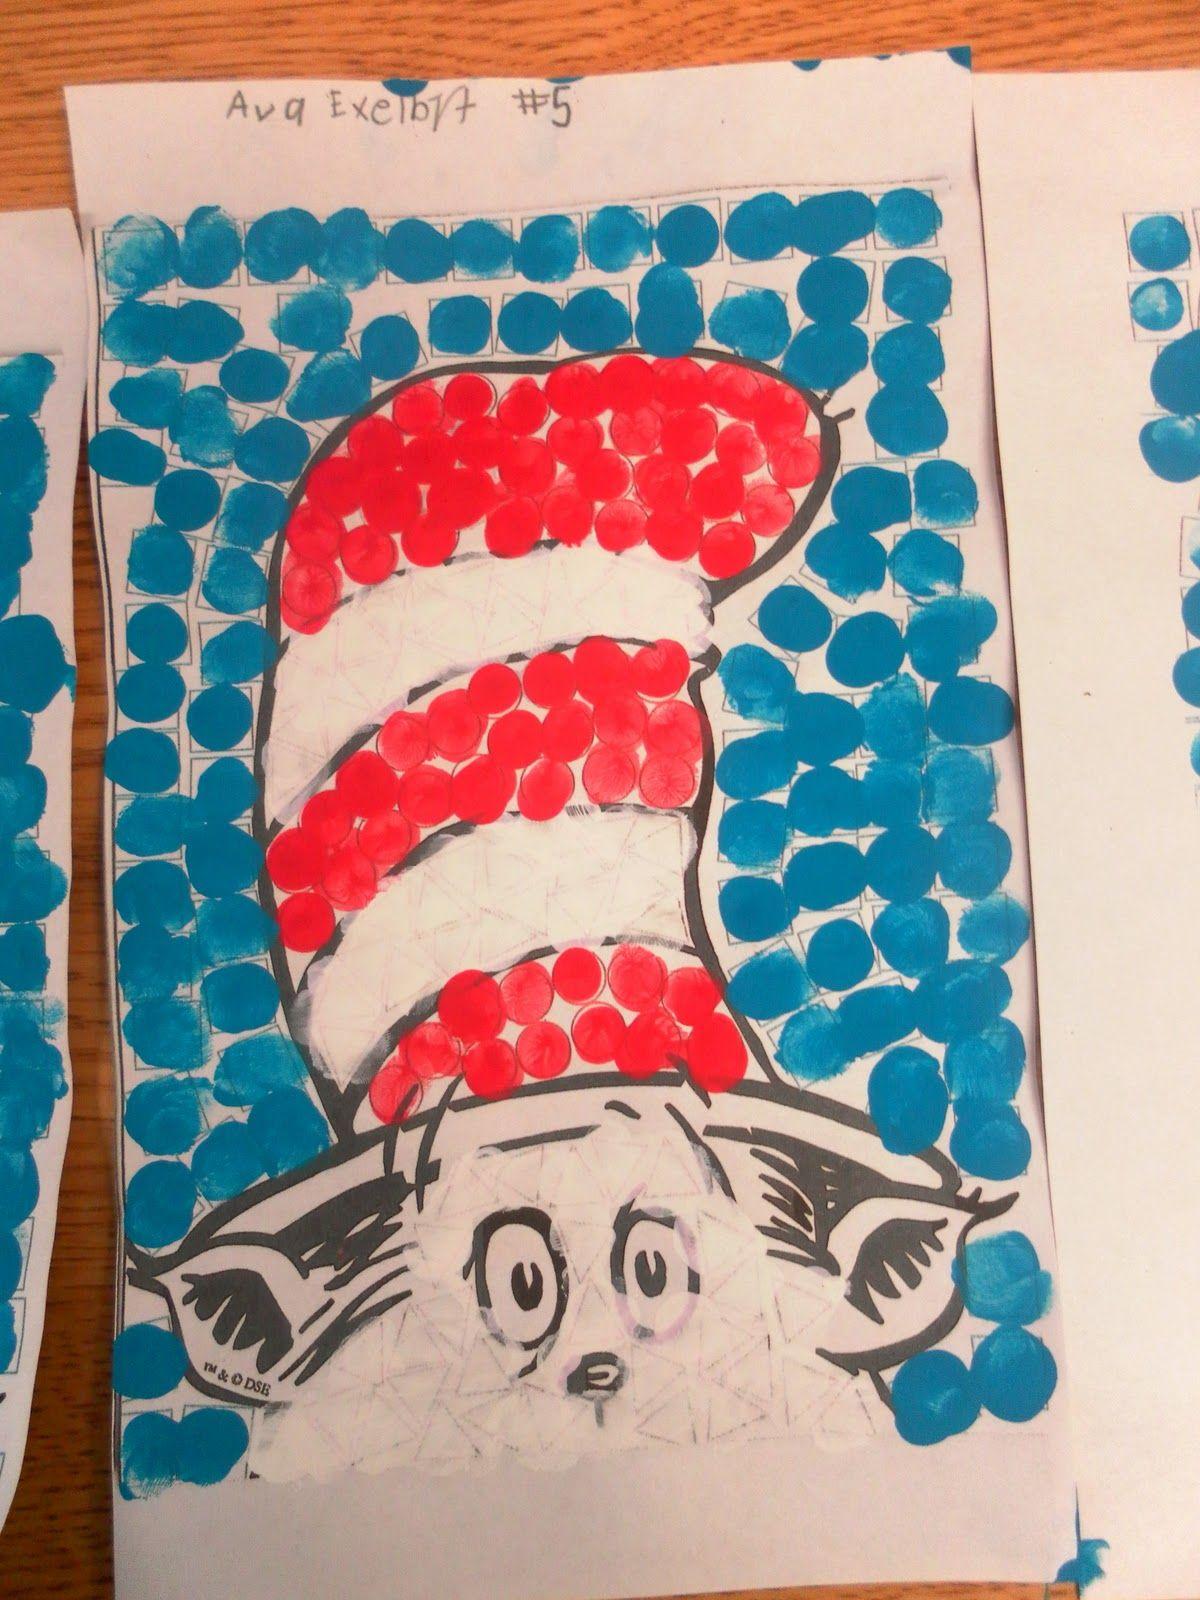 Cat In The Hat Crafts Seuss Crafts Dr Seuss Crafts Dr Seuss Activities